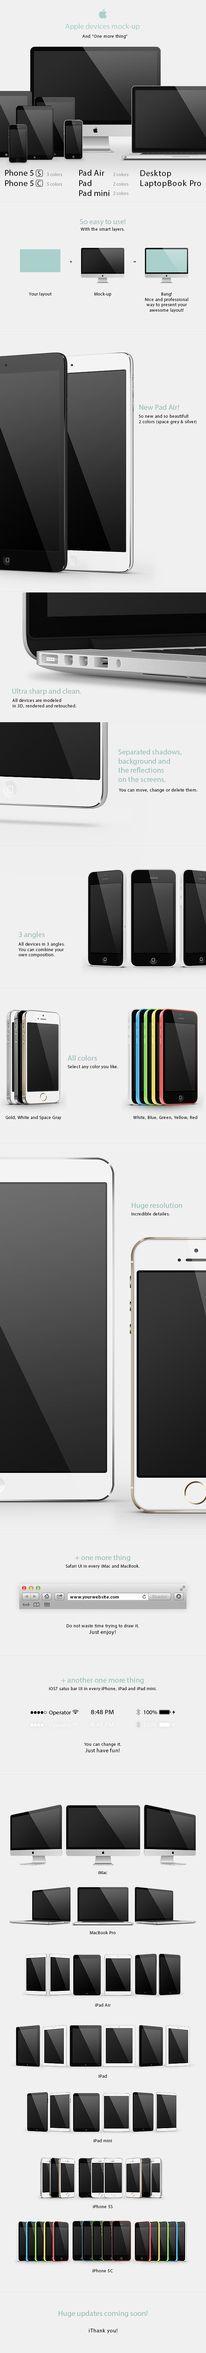 Apple devices mock-up on Behance https://www.behance.net/gallery/11612007/Apple-devices-mock-up — Designspiration